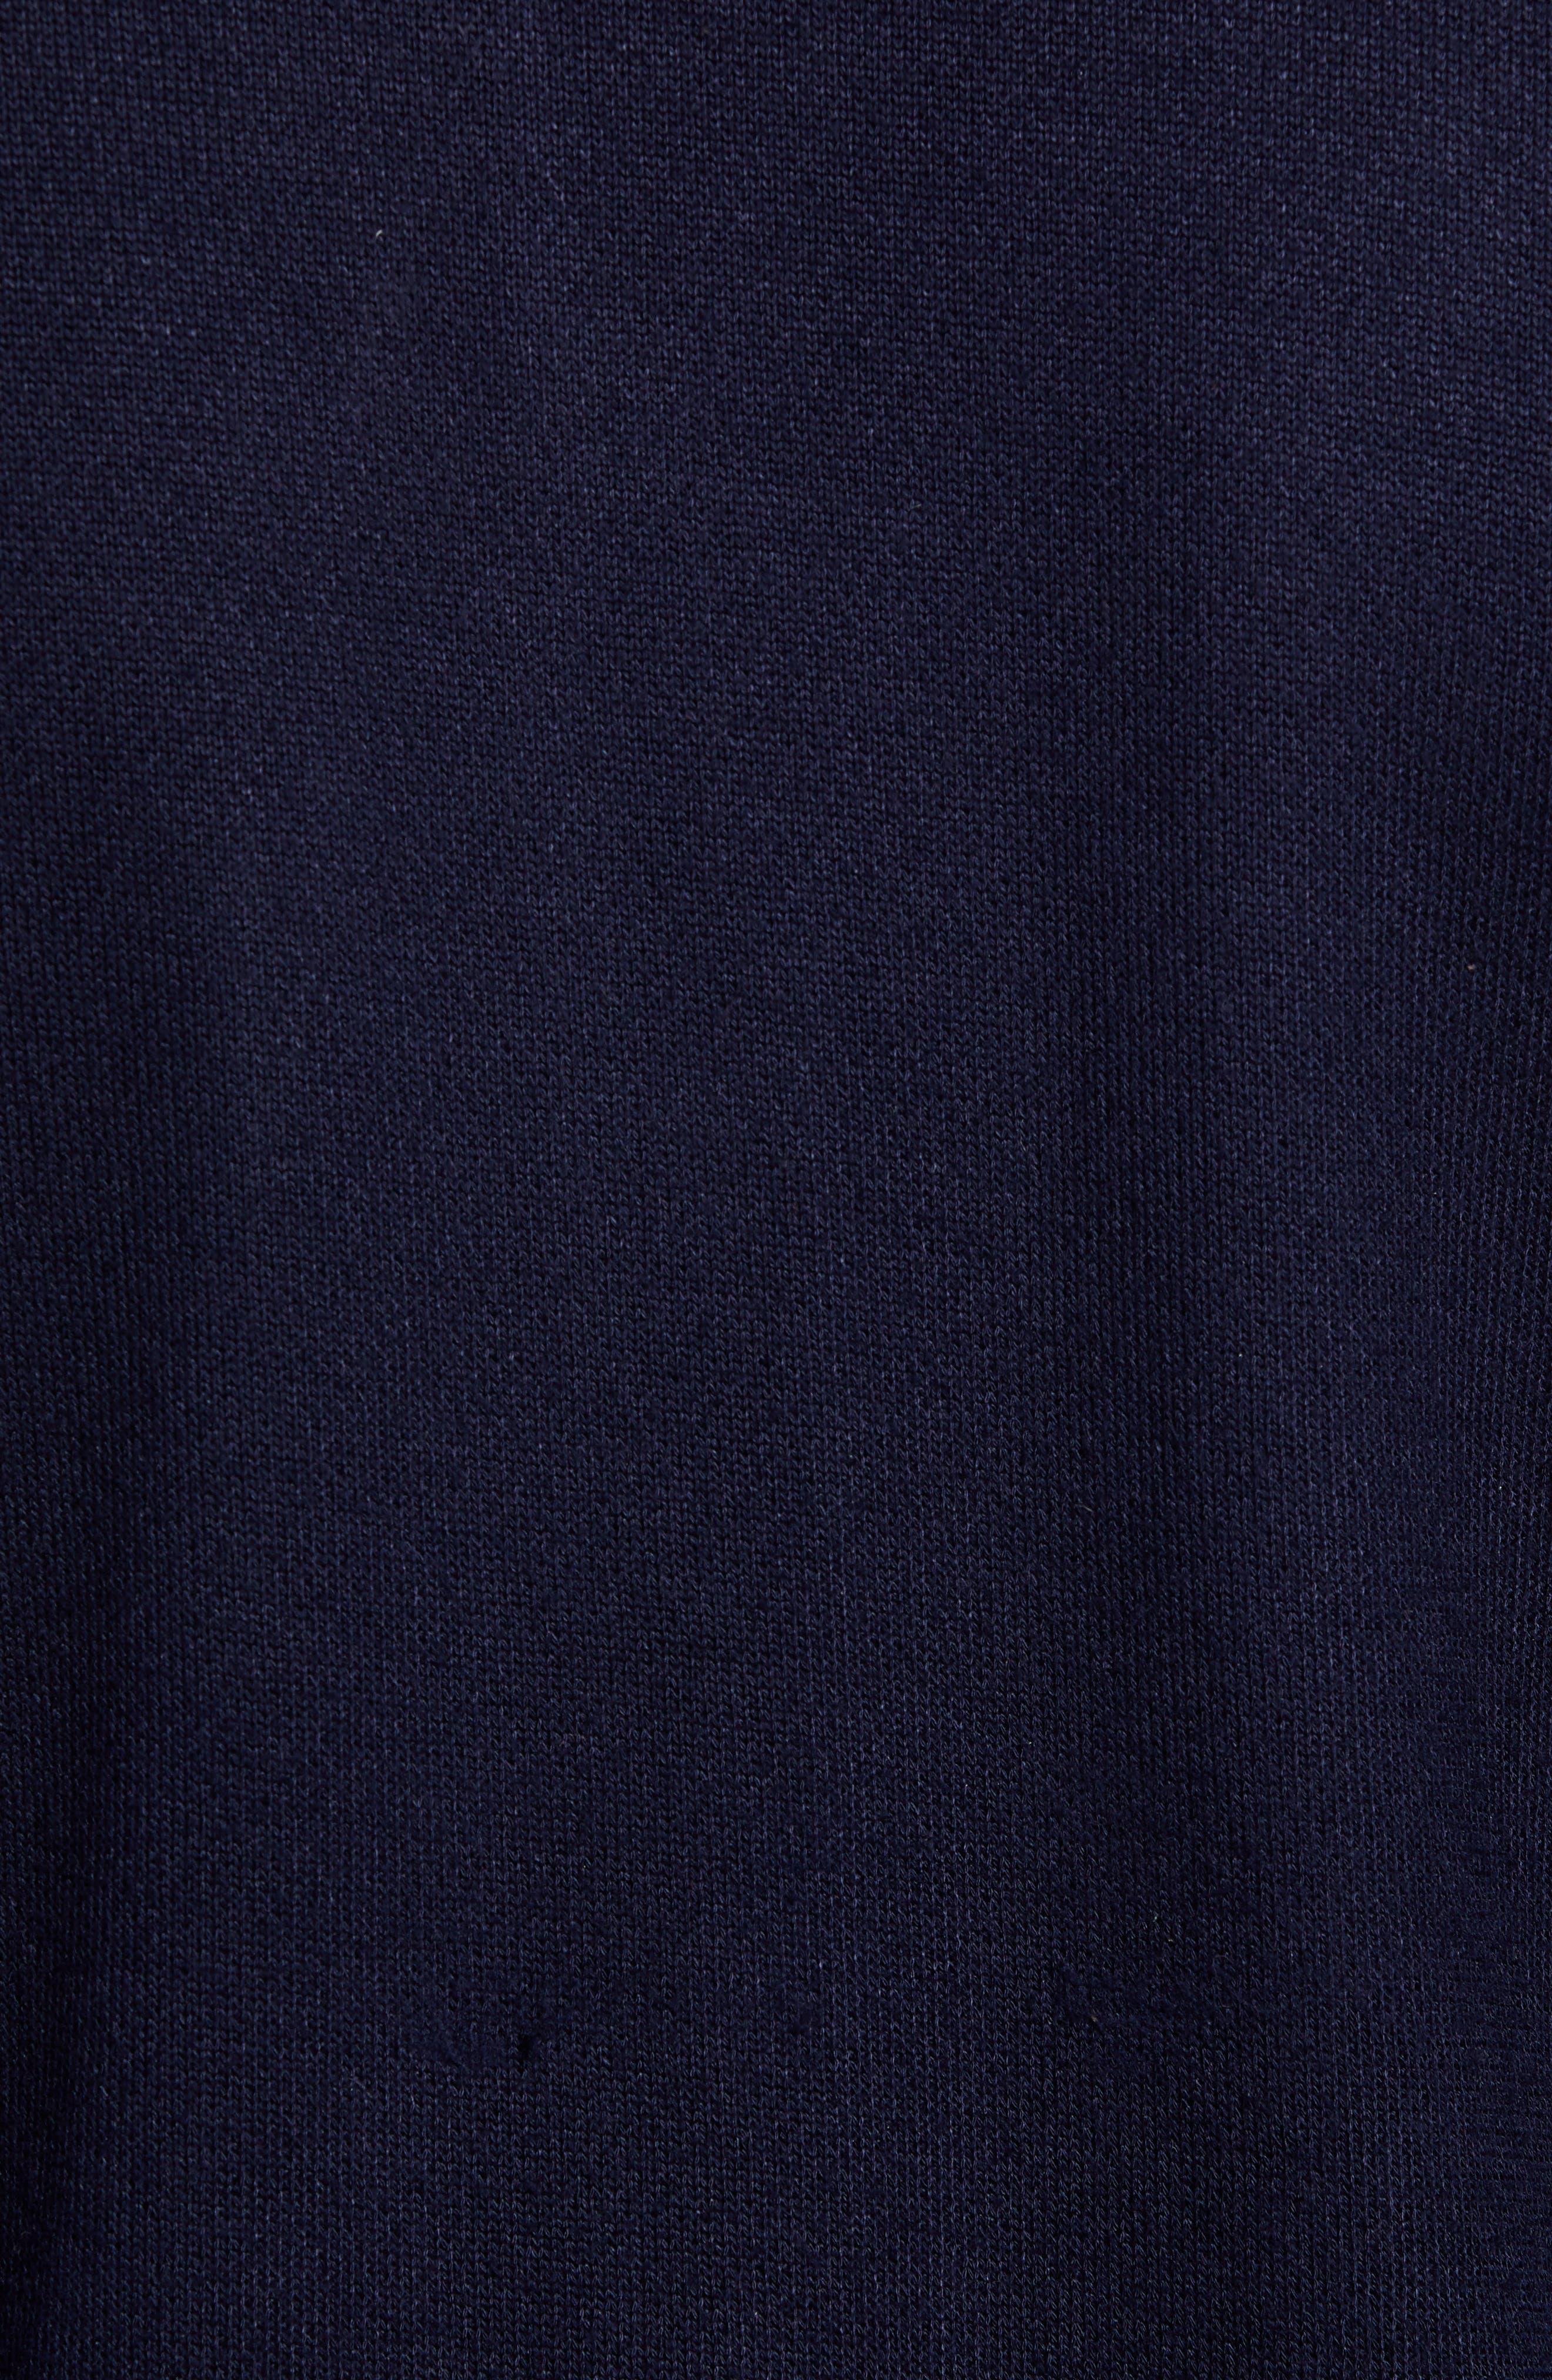 TED BAKER LONDON,                             Cadbir Trim Fit Jersey Bomber Jacket,                             Alternate thumbnail 5, color,                             410